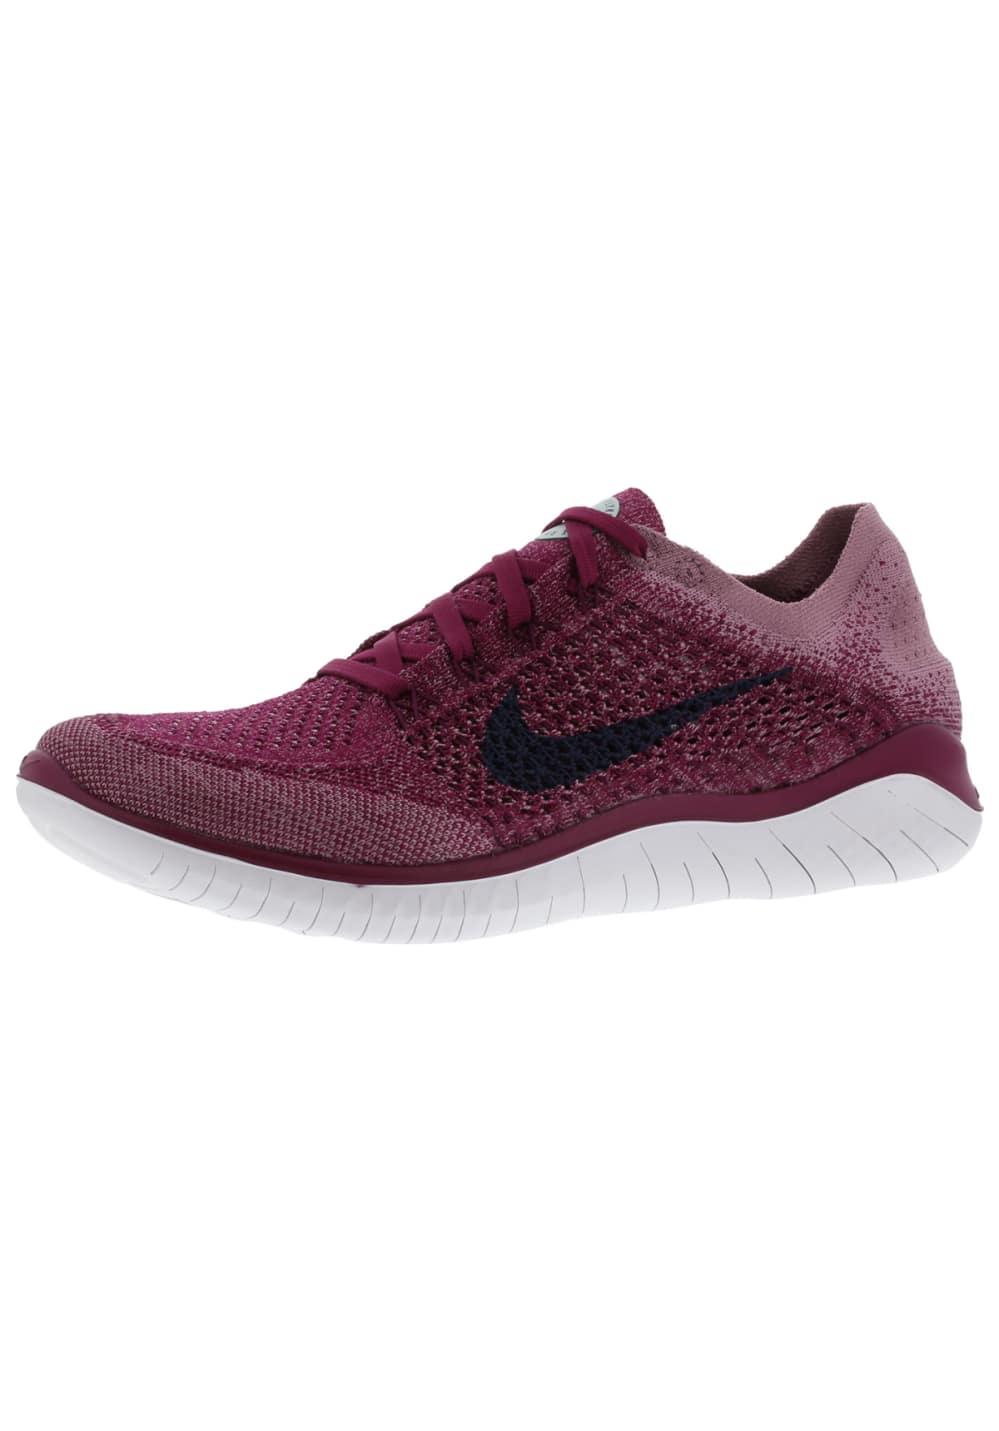 Nike Chaussures Free Pour Flyknit Femme 2018 Running Rose Rn hsQtdCxr